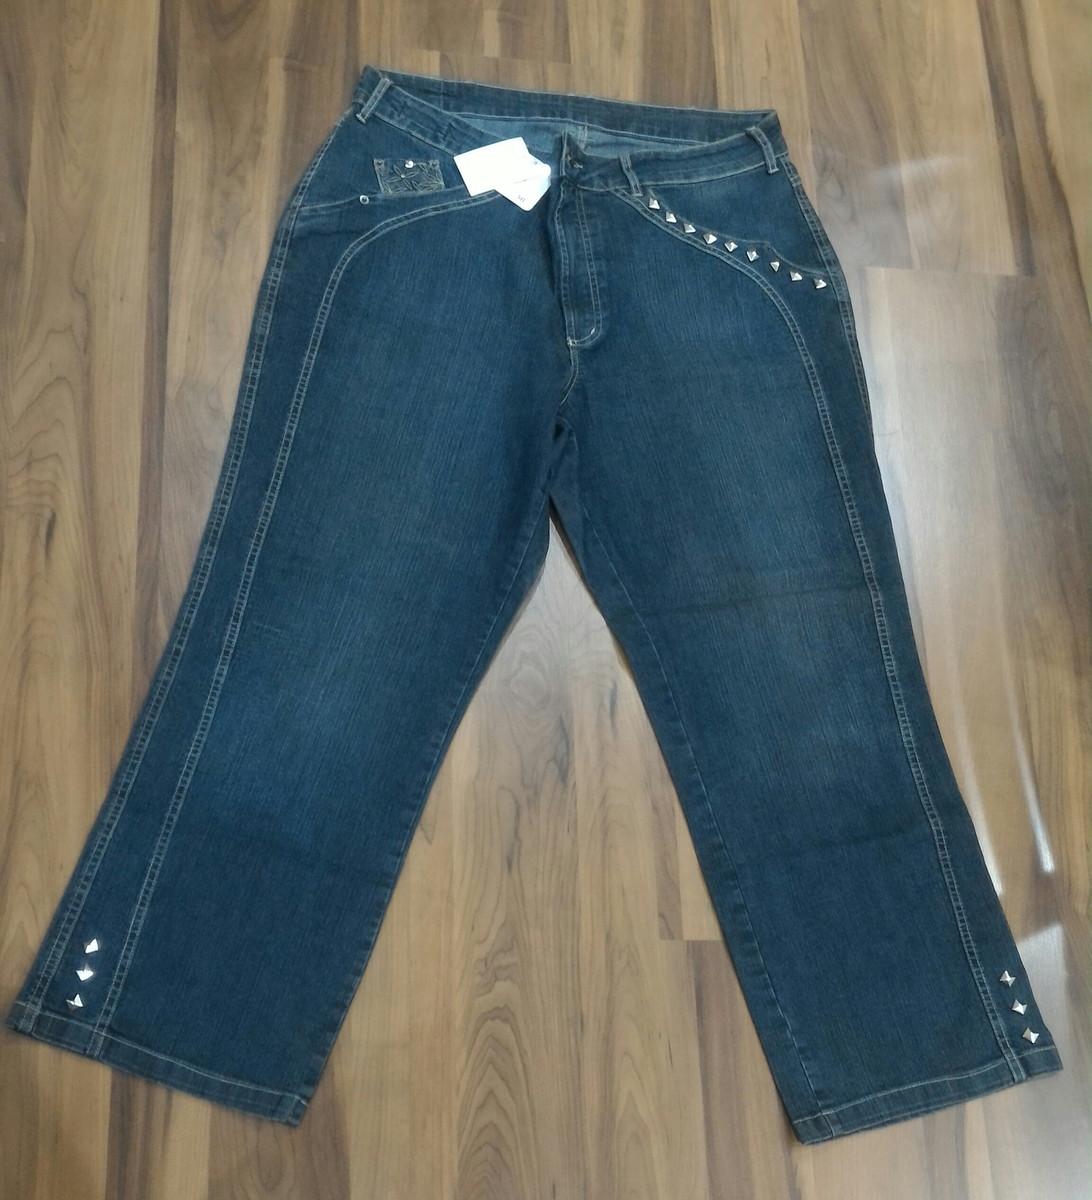 30b1a3dc1 Calça Jeans Plus Size Customizada Nº 50 no Elo7   GG Sexy (F08111)